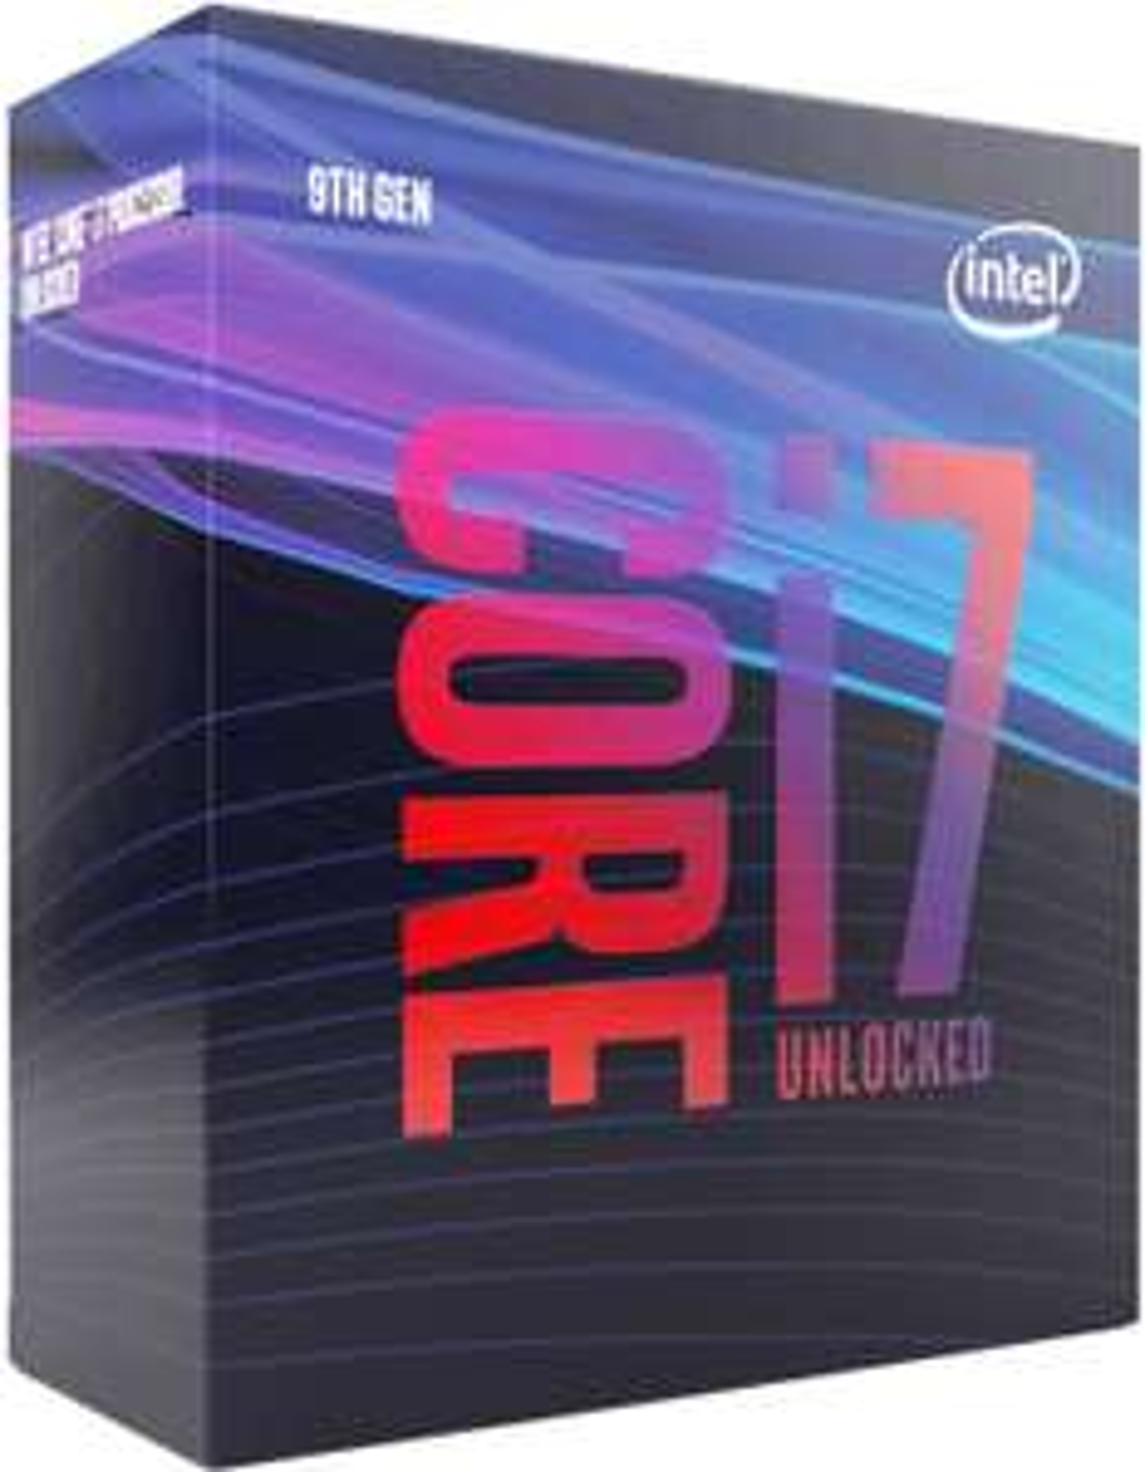 Amazon.de Intel Core i7-9700K Prozessor (Amazon als Verkäufer wählen)